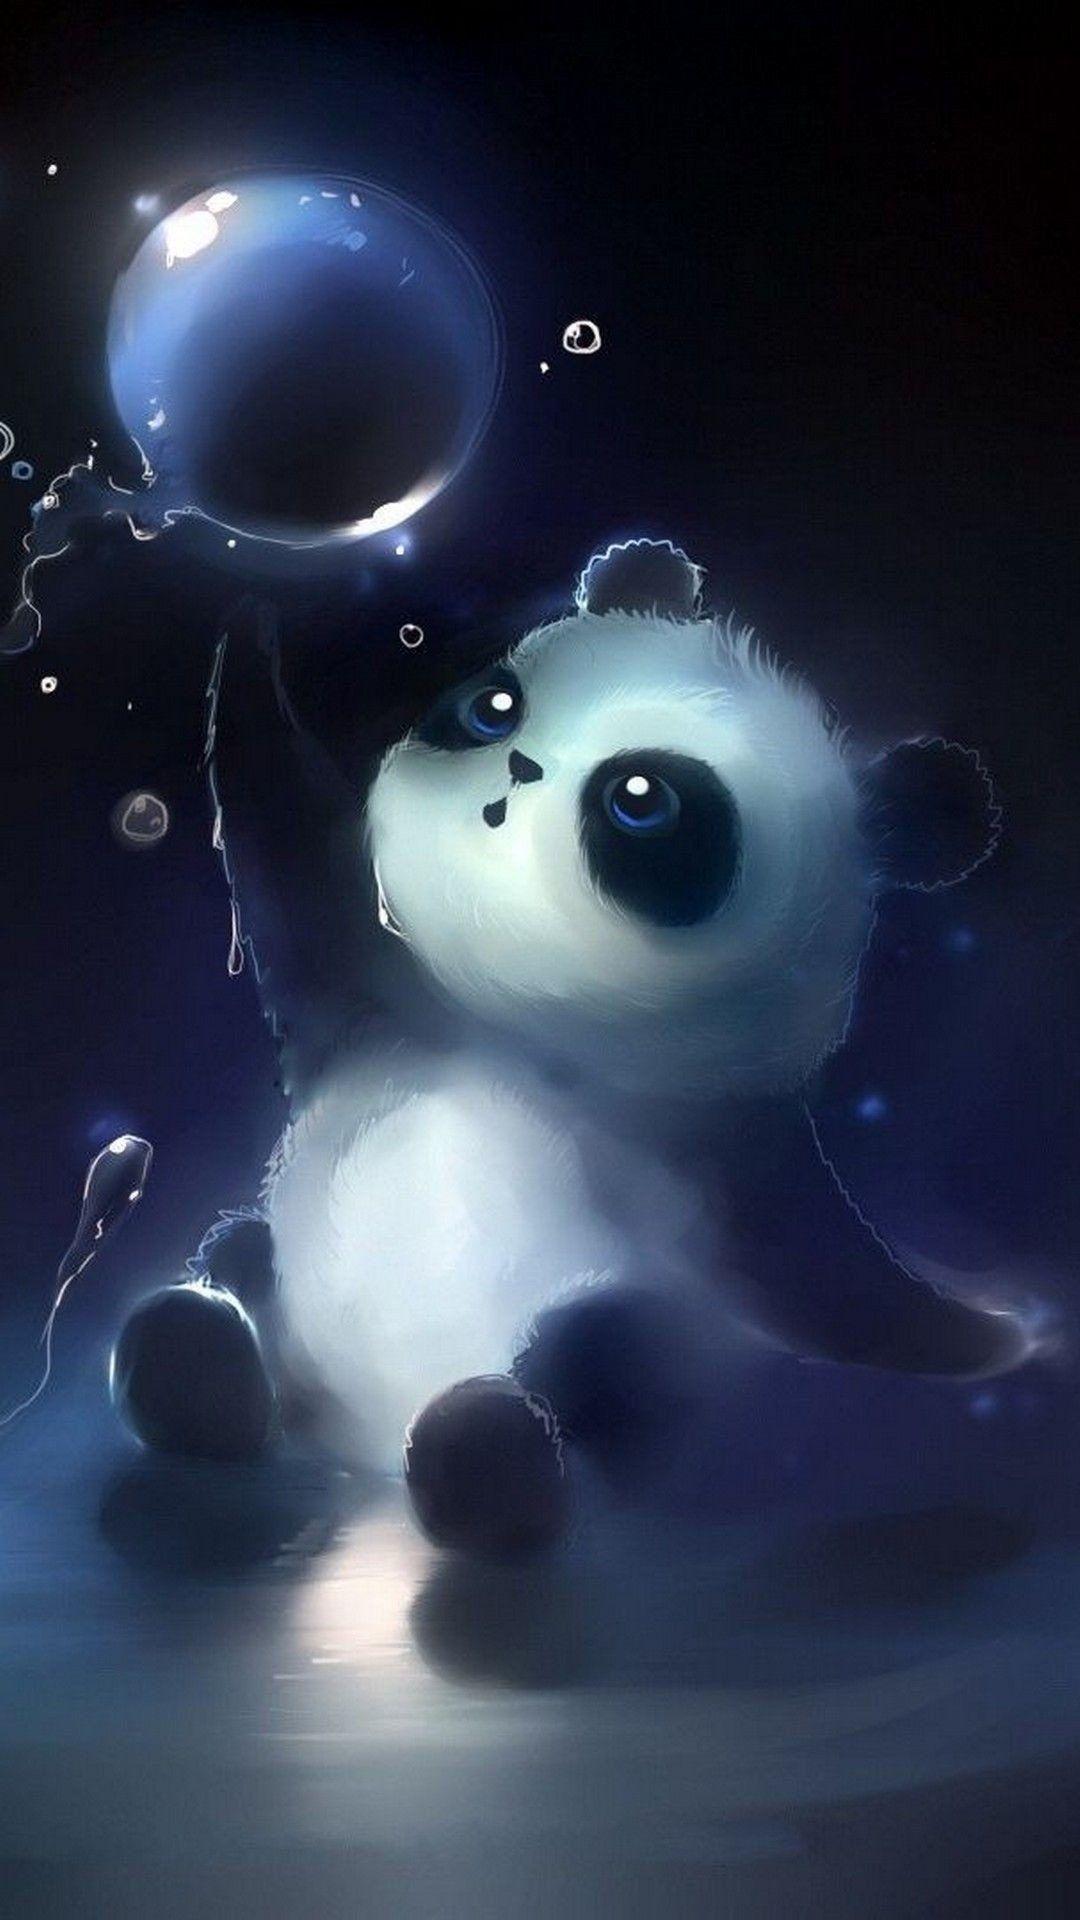 خلفيات عالية الوضوح ل باندا Panda حيوانات 6 Cute Panda Wallpaper Panda Art Panda Background